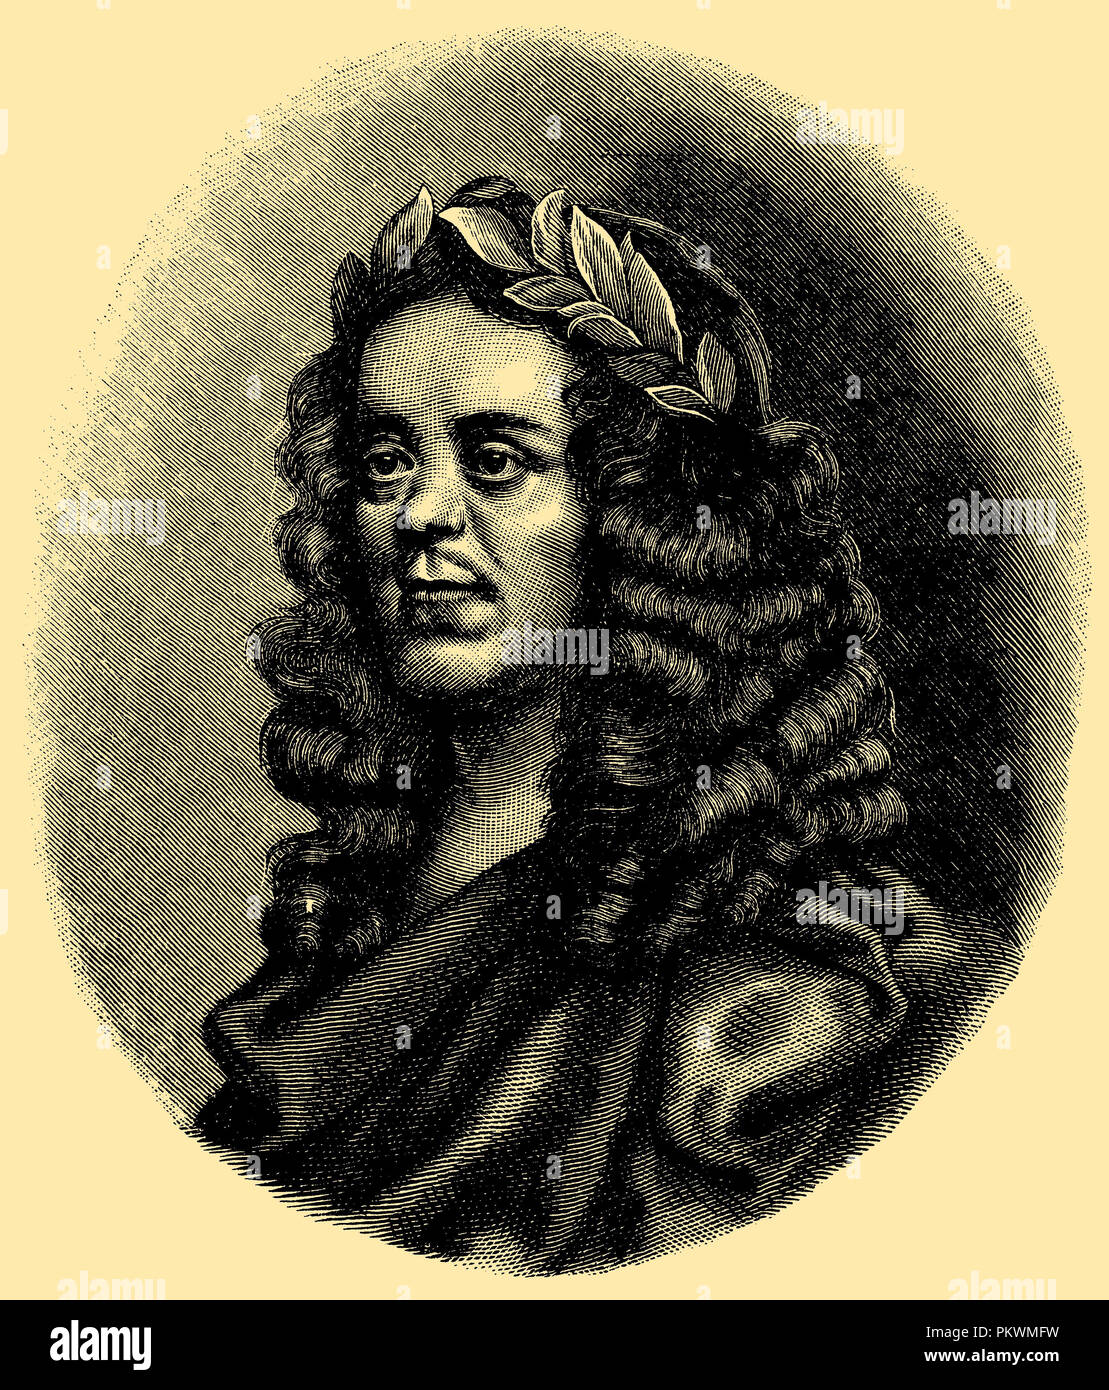 William Davenant biography